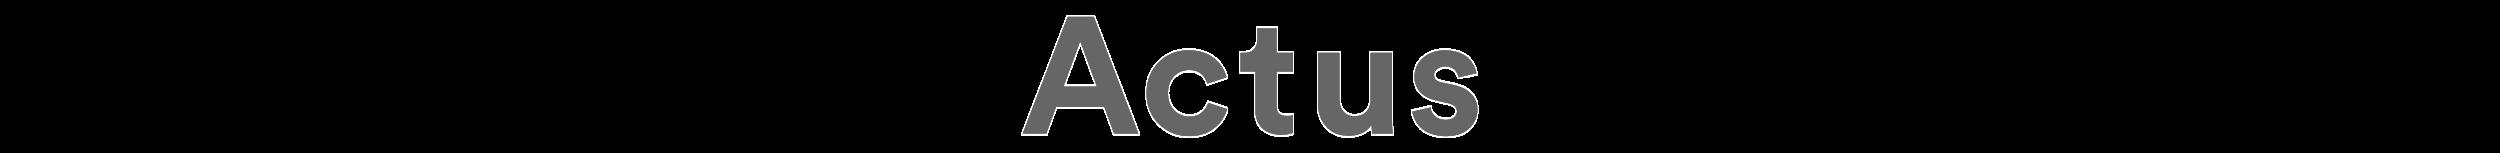 Actus Logo banner_Lightgray_banner.png